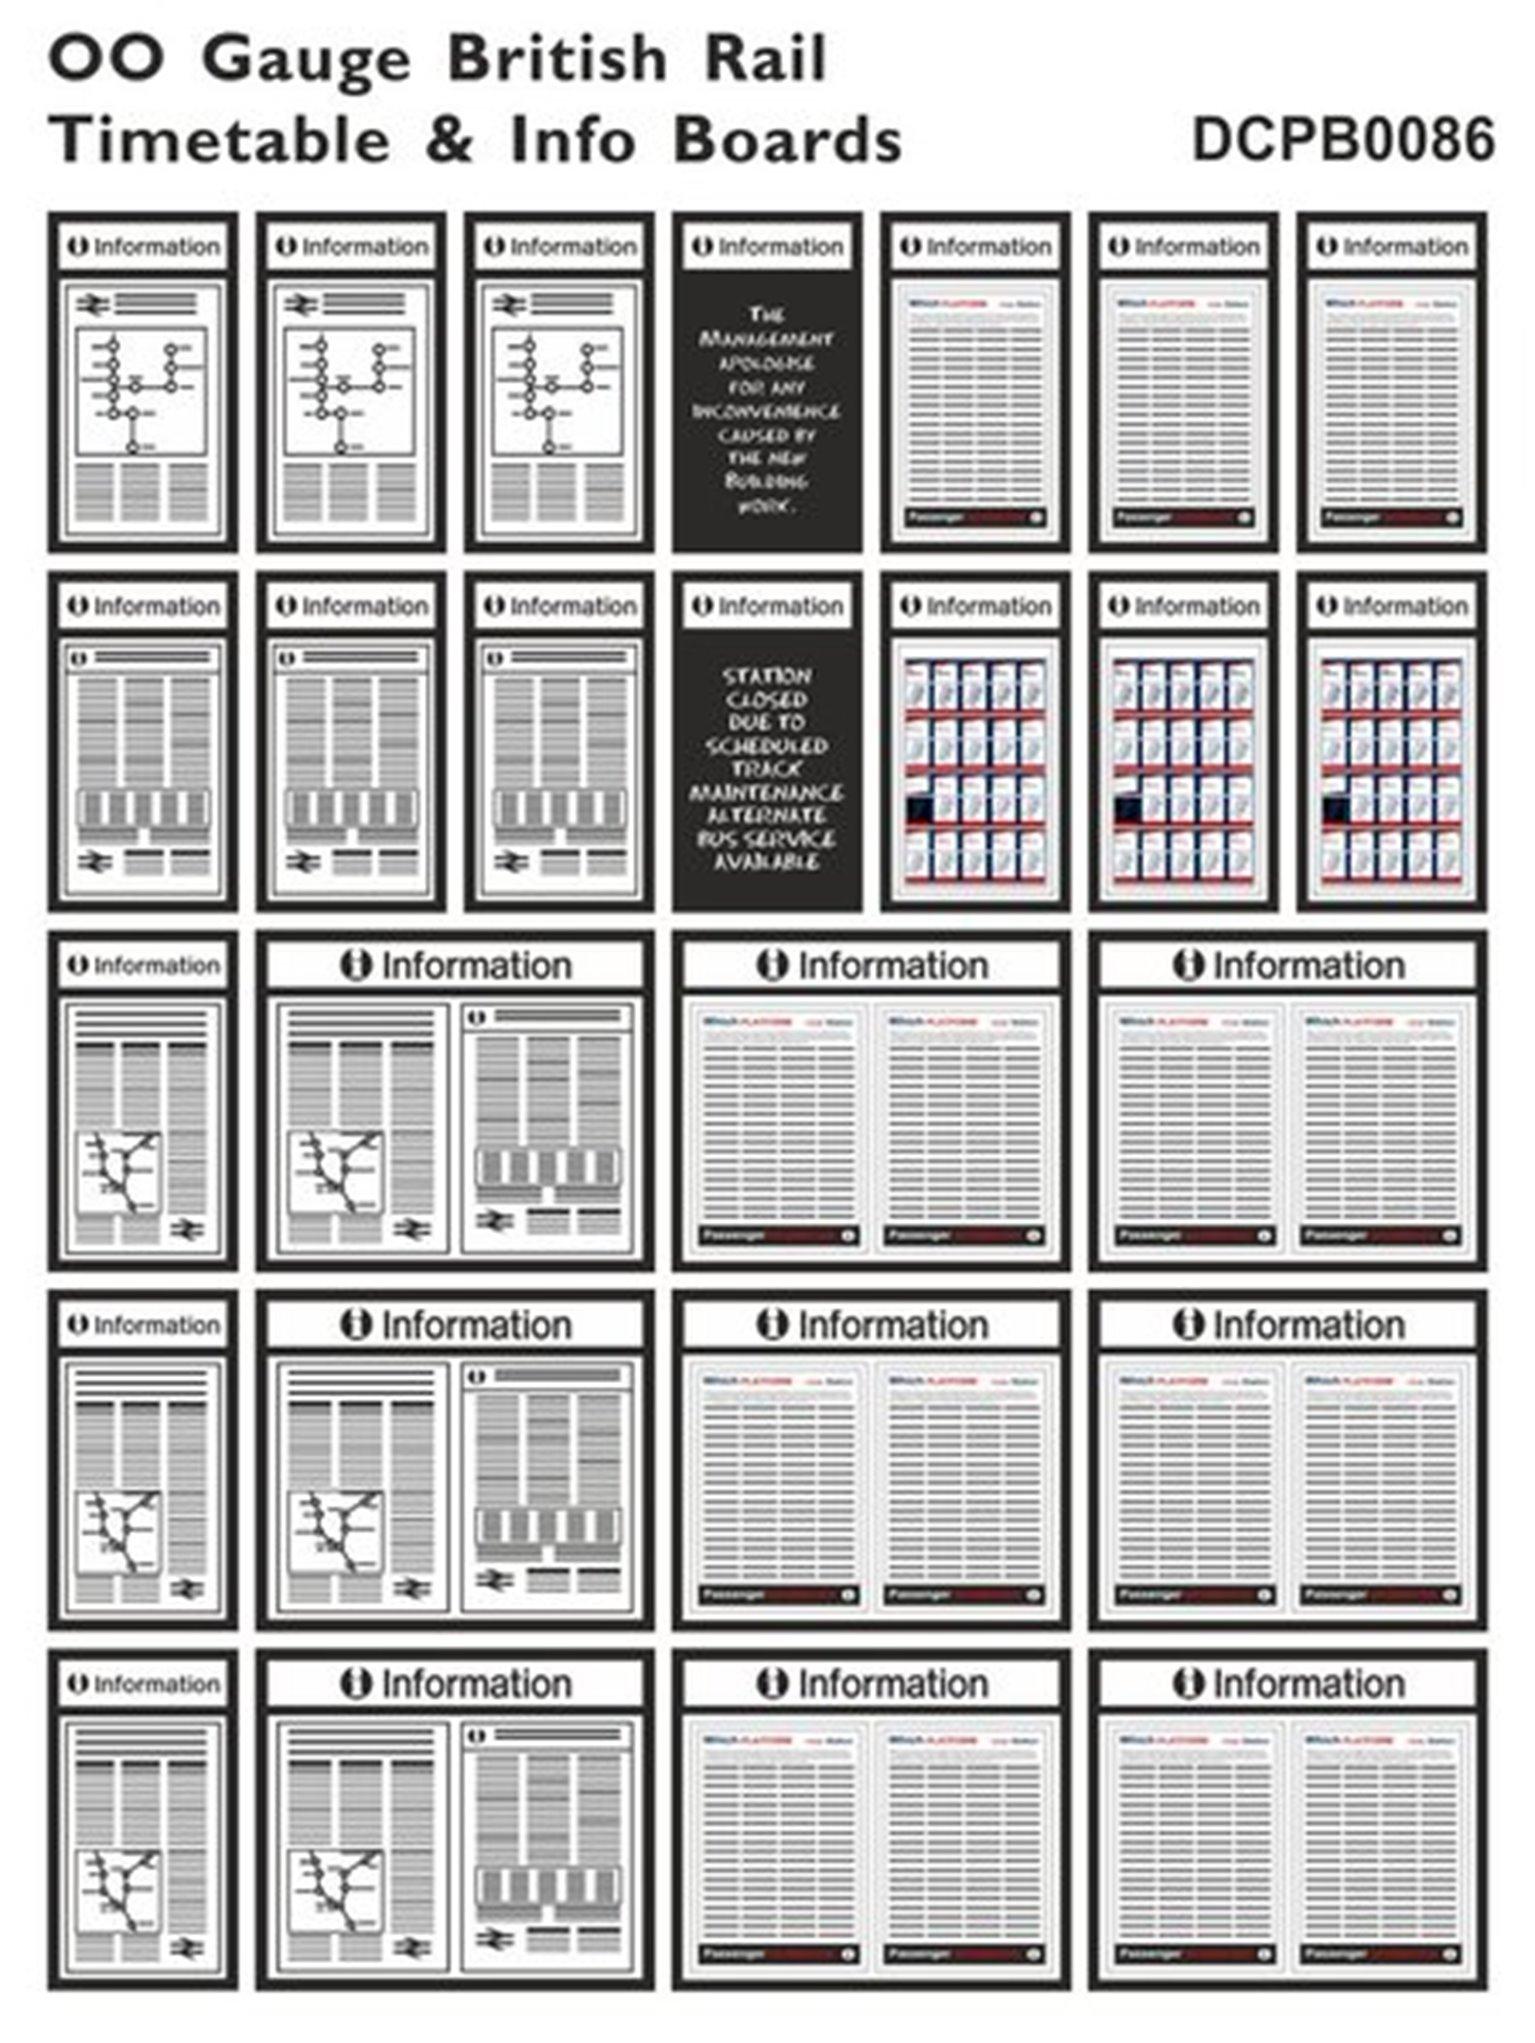 British Rail Timetable & Info Boards